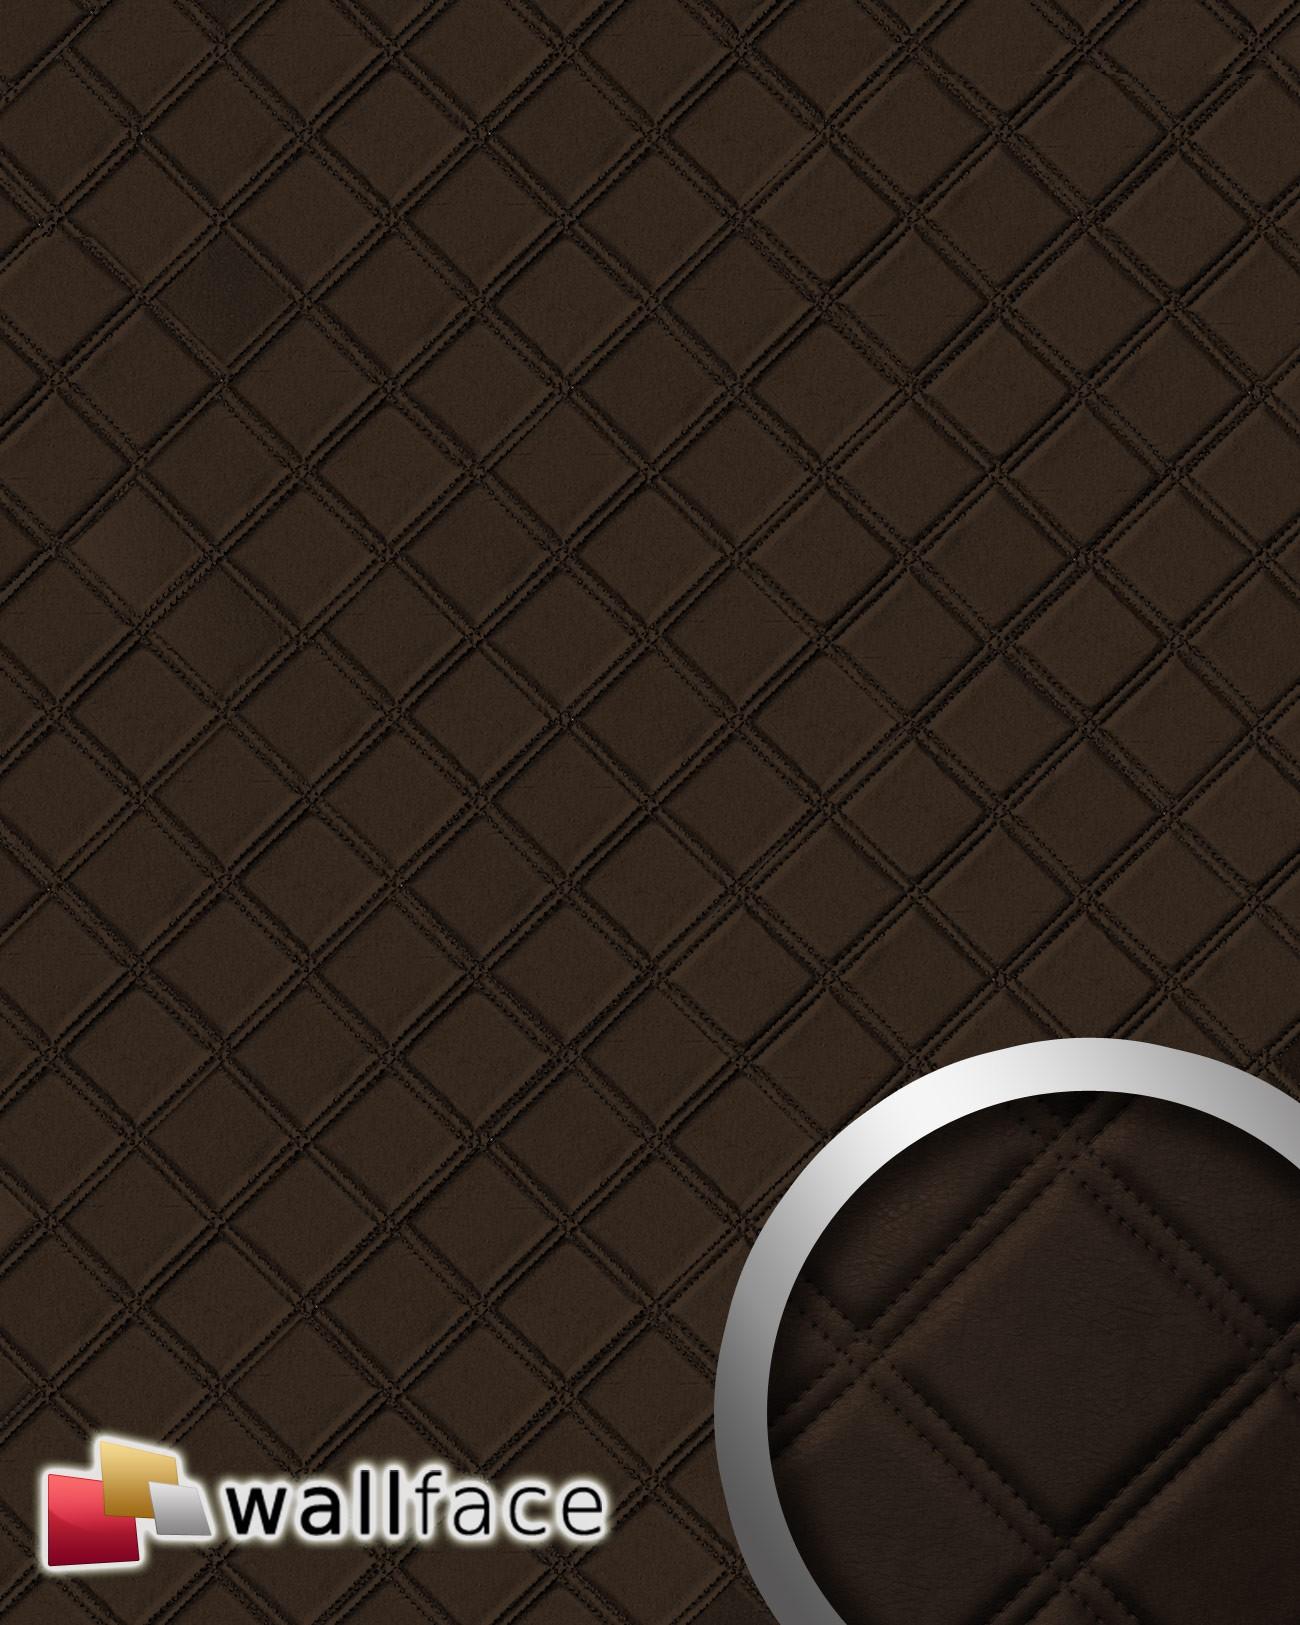 Panou Decorativ Leather 15037  Wallface  Autocolan